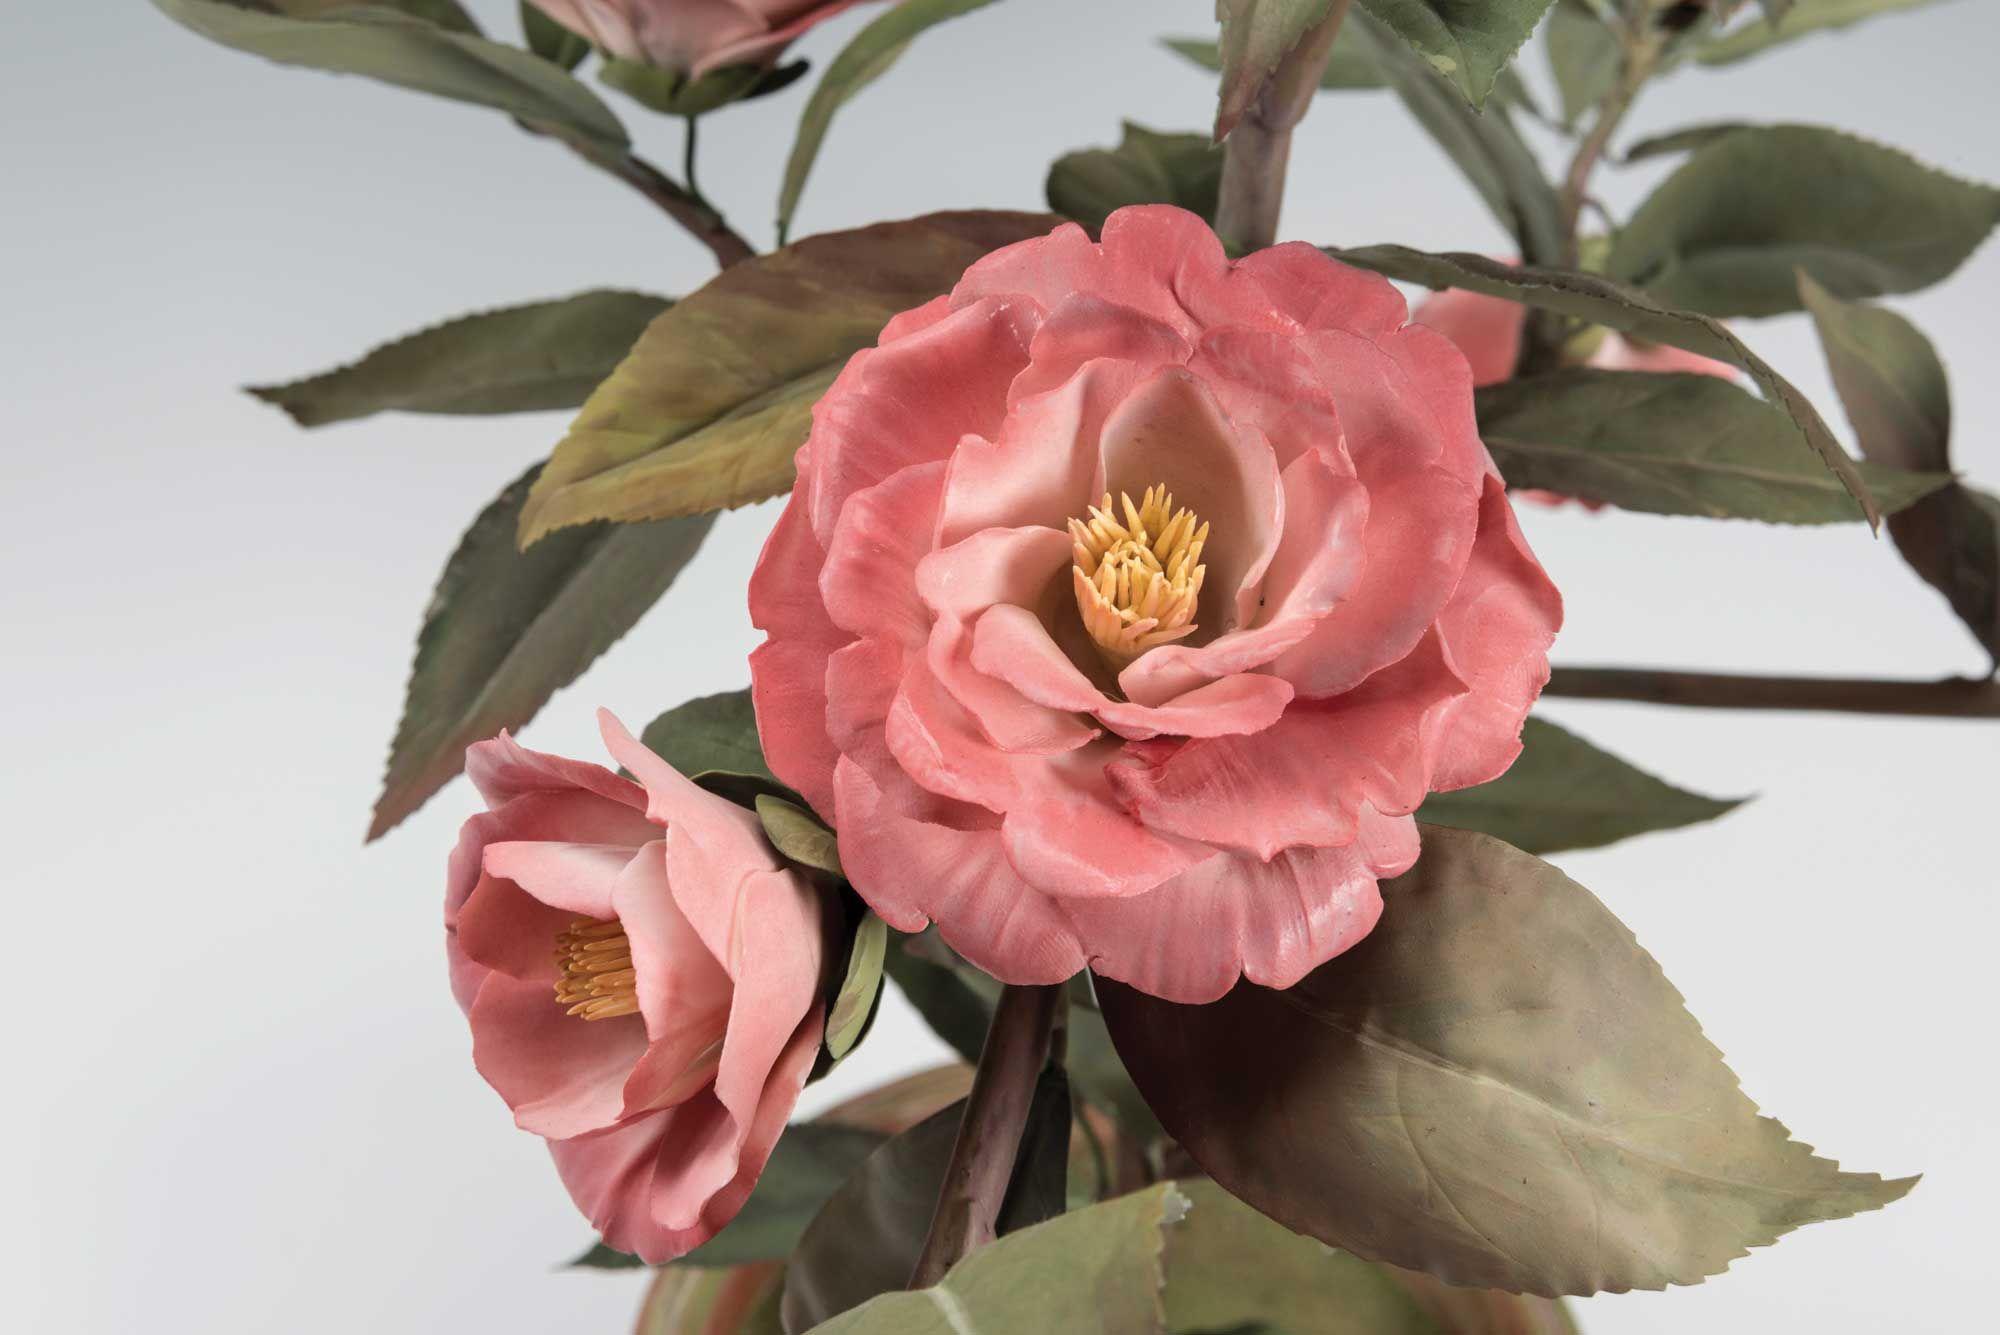 Vladimir Kanevsky: The Man Who Makes Flowers From Porcelain